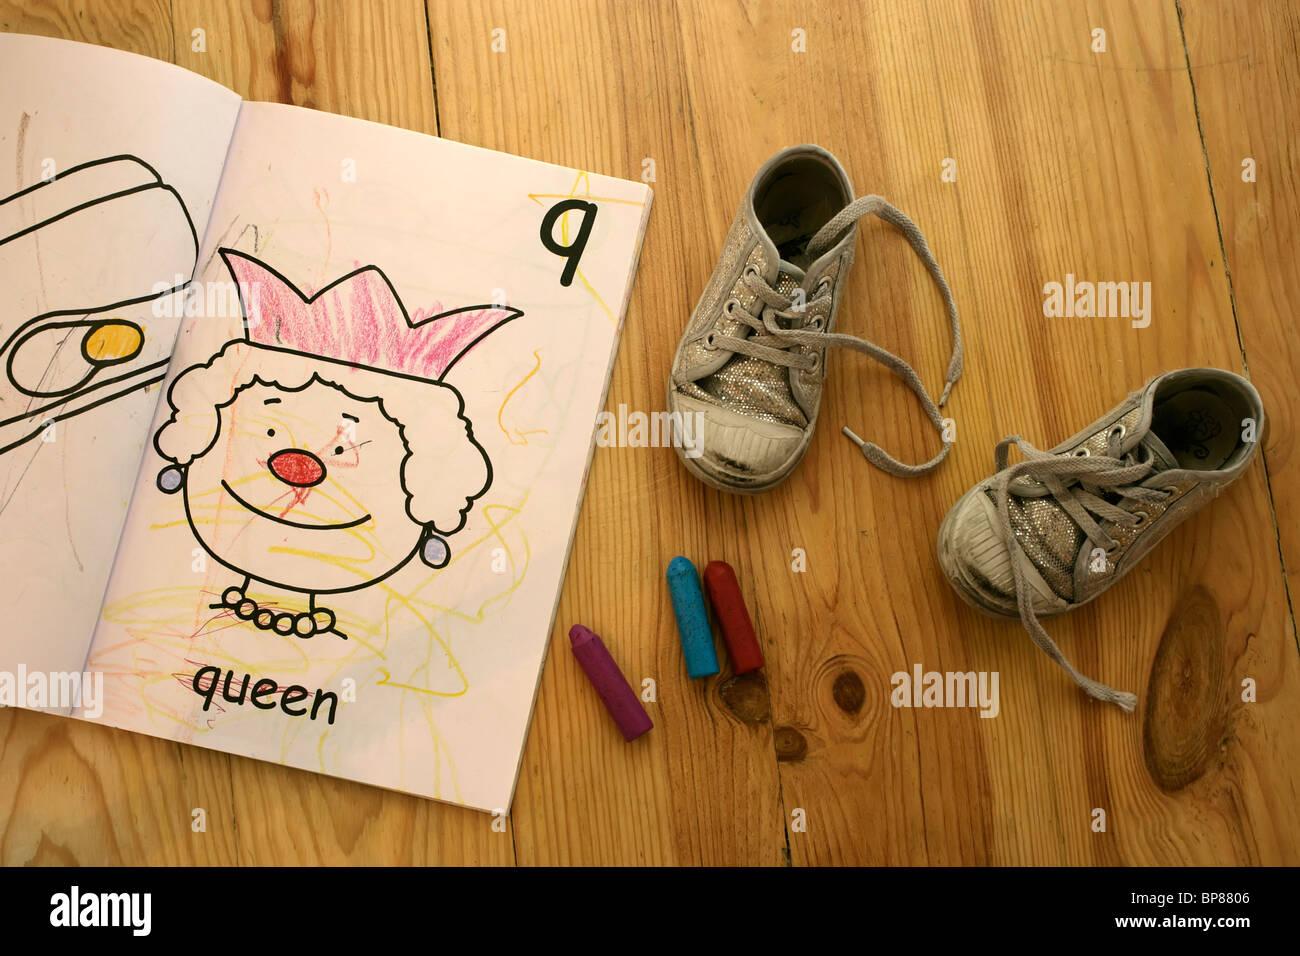 colouring book and crayons stock photos colouring book and crayons